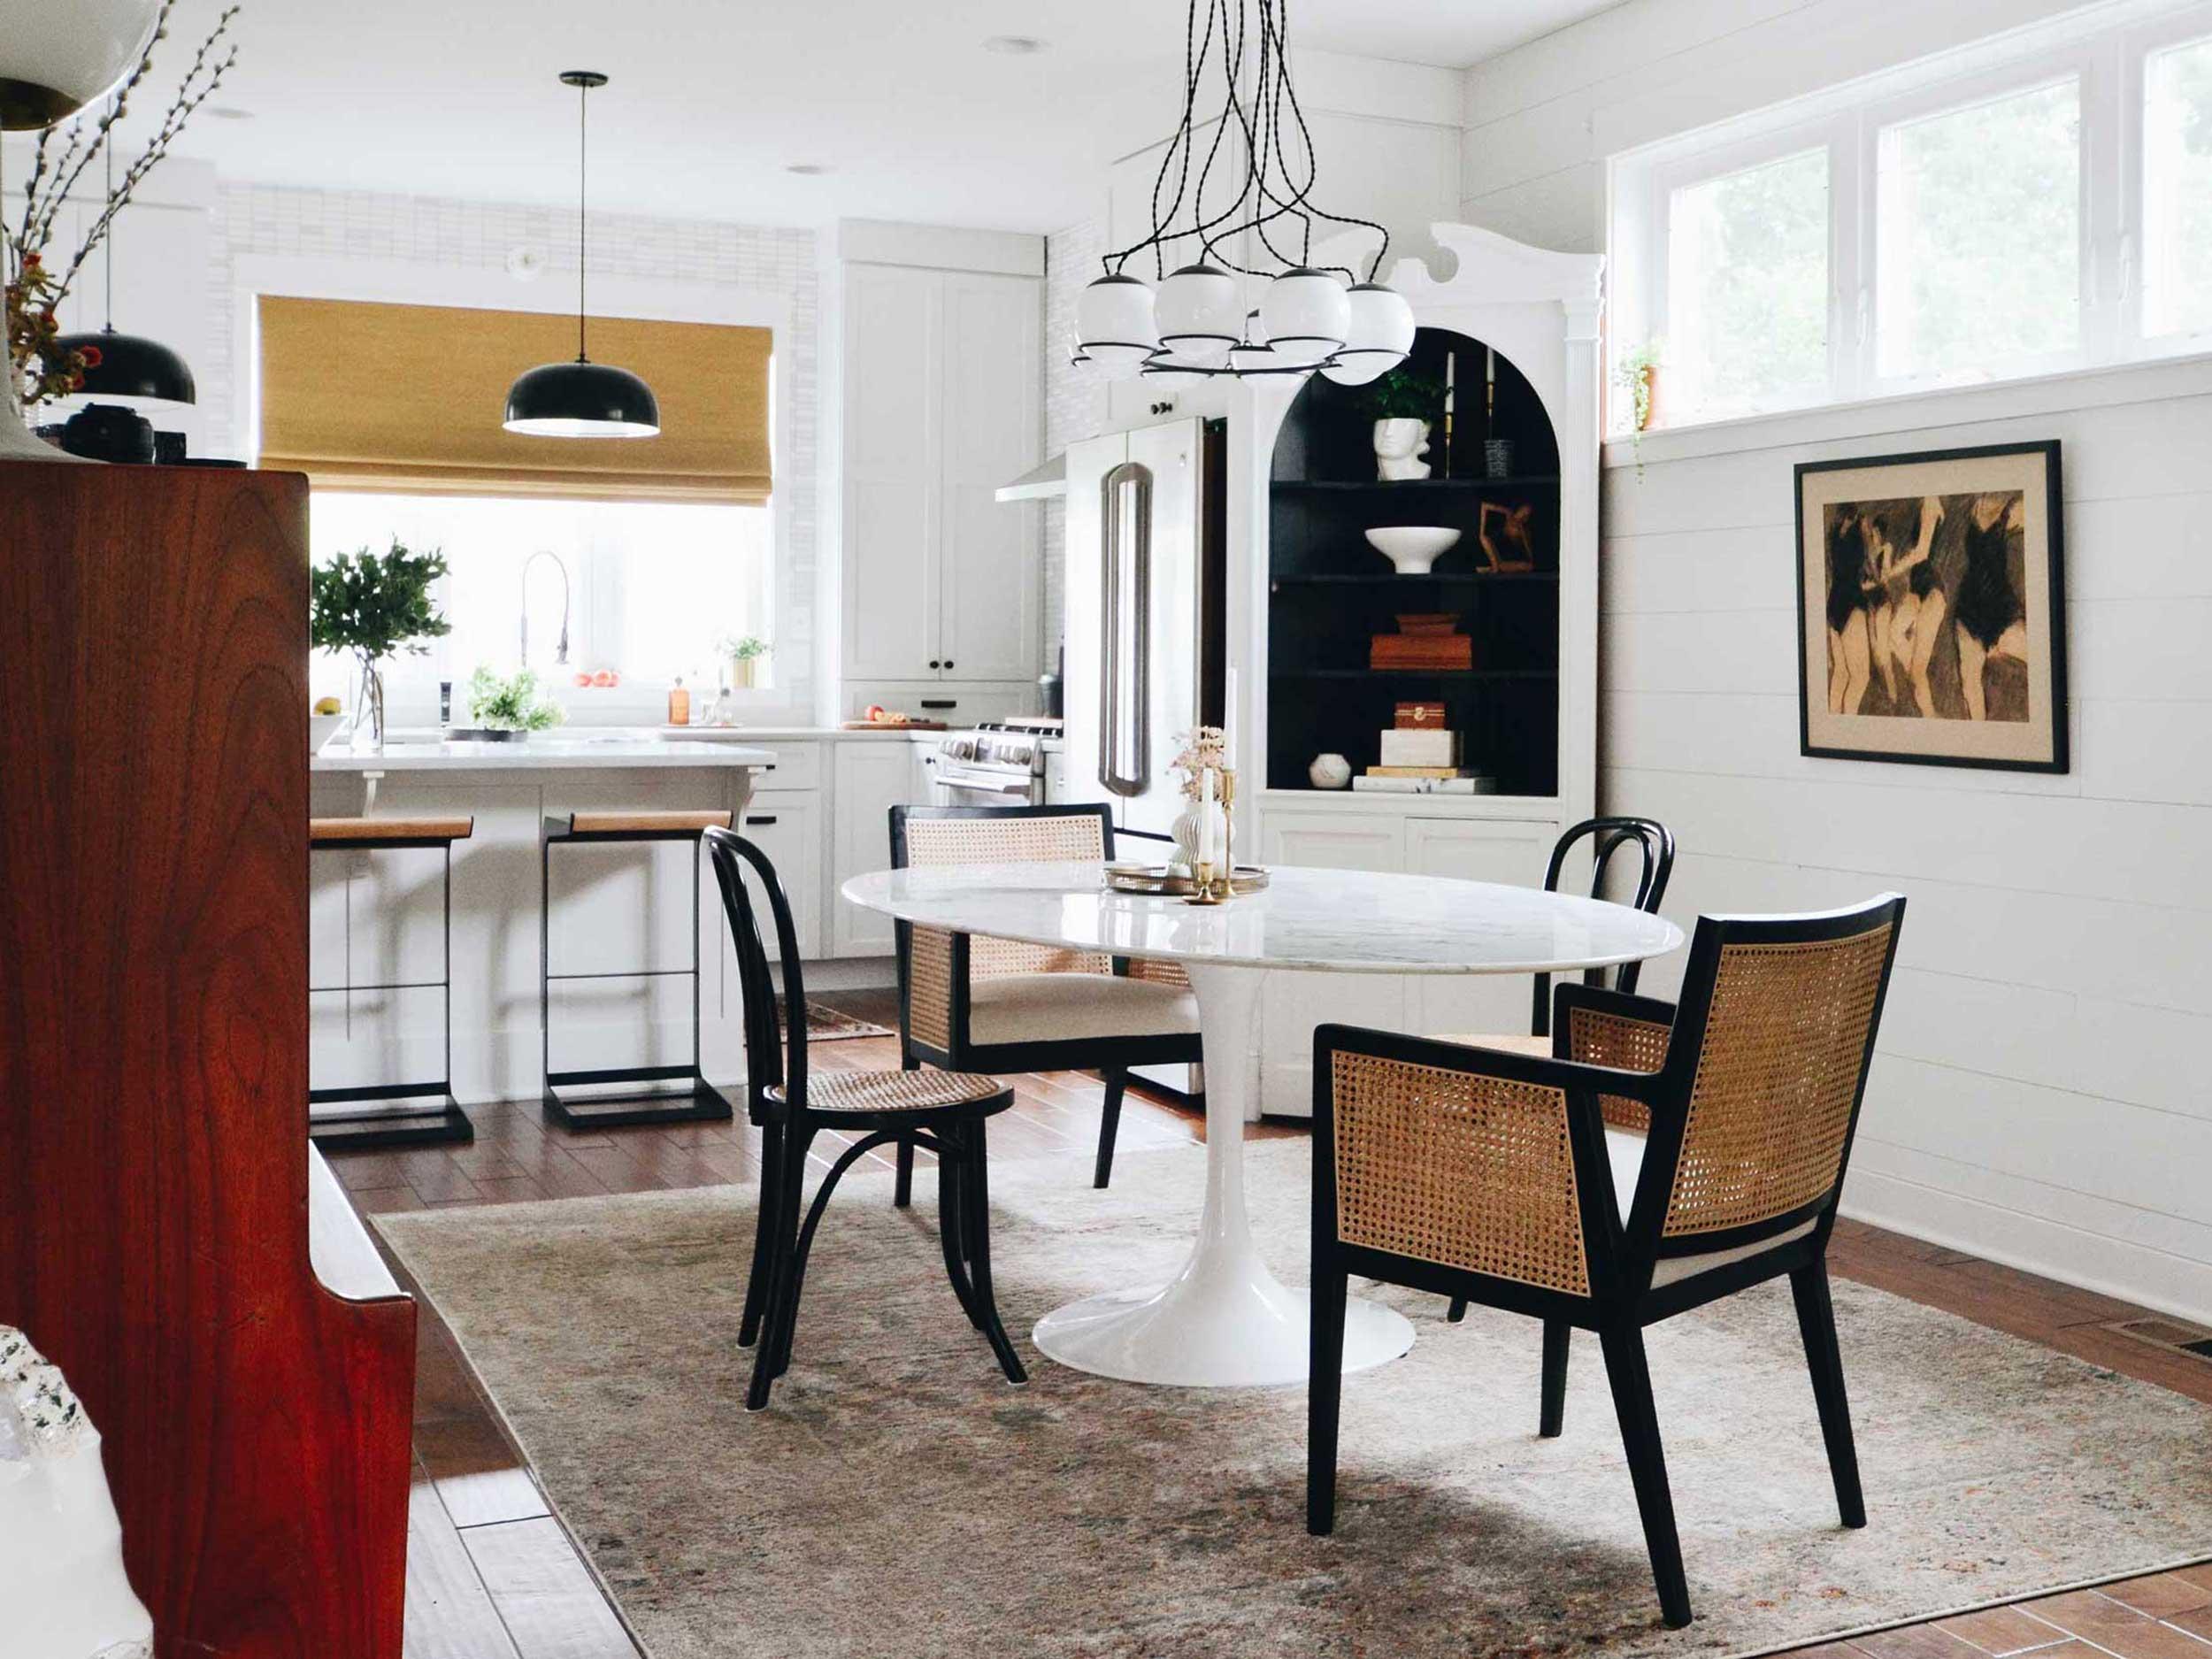 Farmhouse Interior Design Style focuses on aesthetics